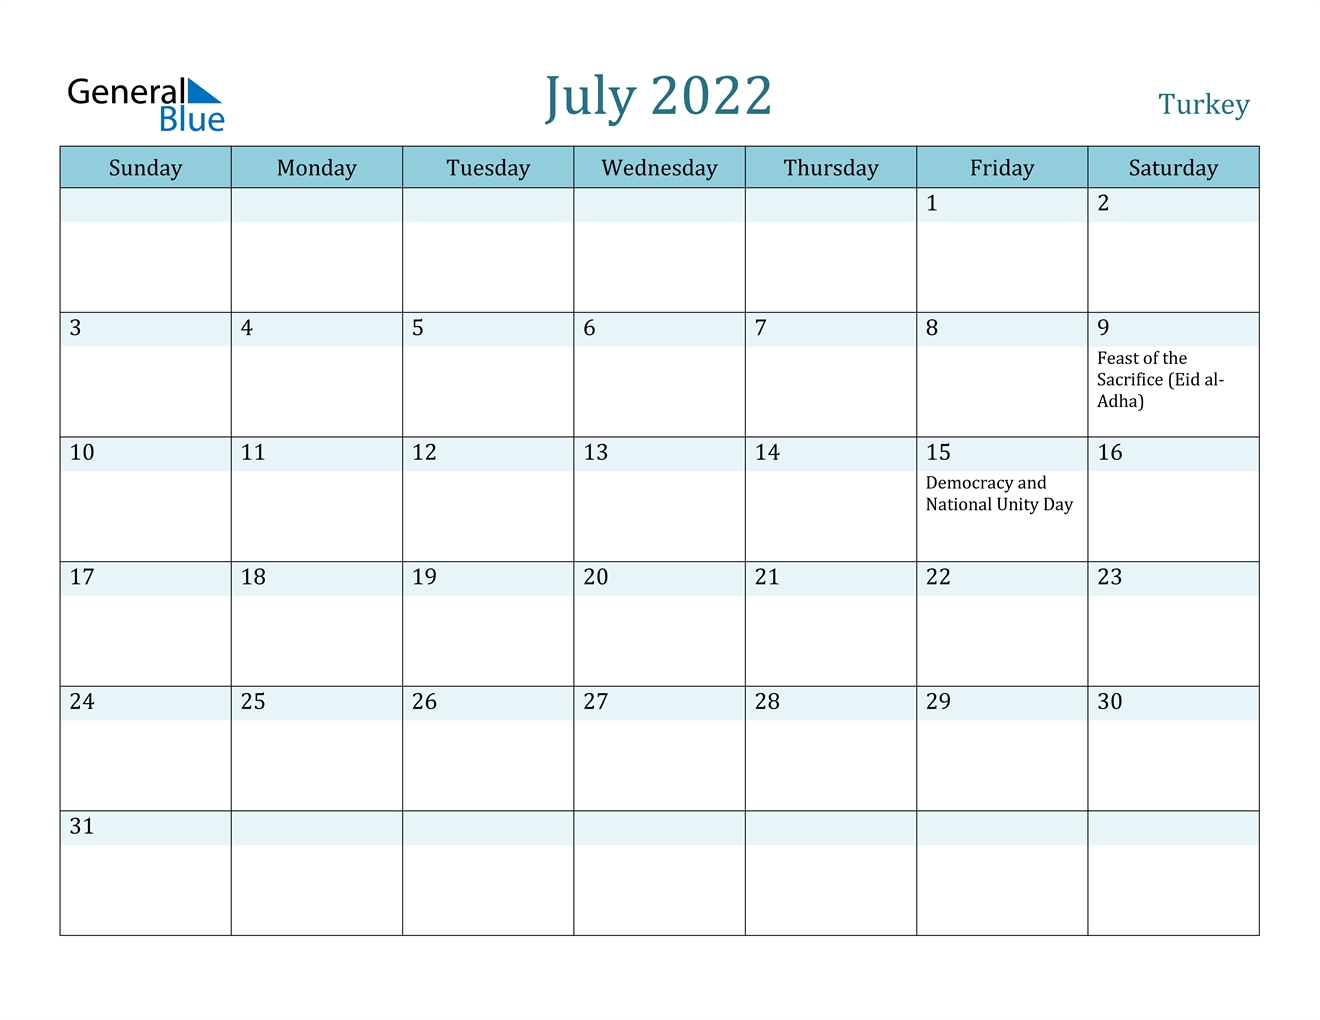 July 2022 Calendar - Turkey